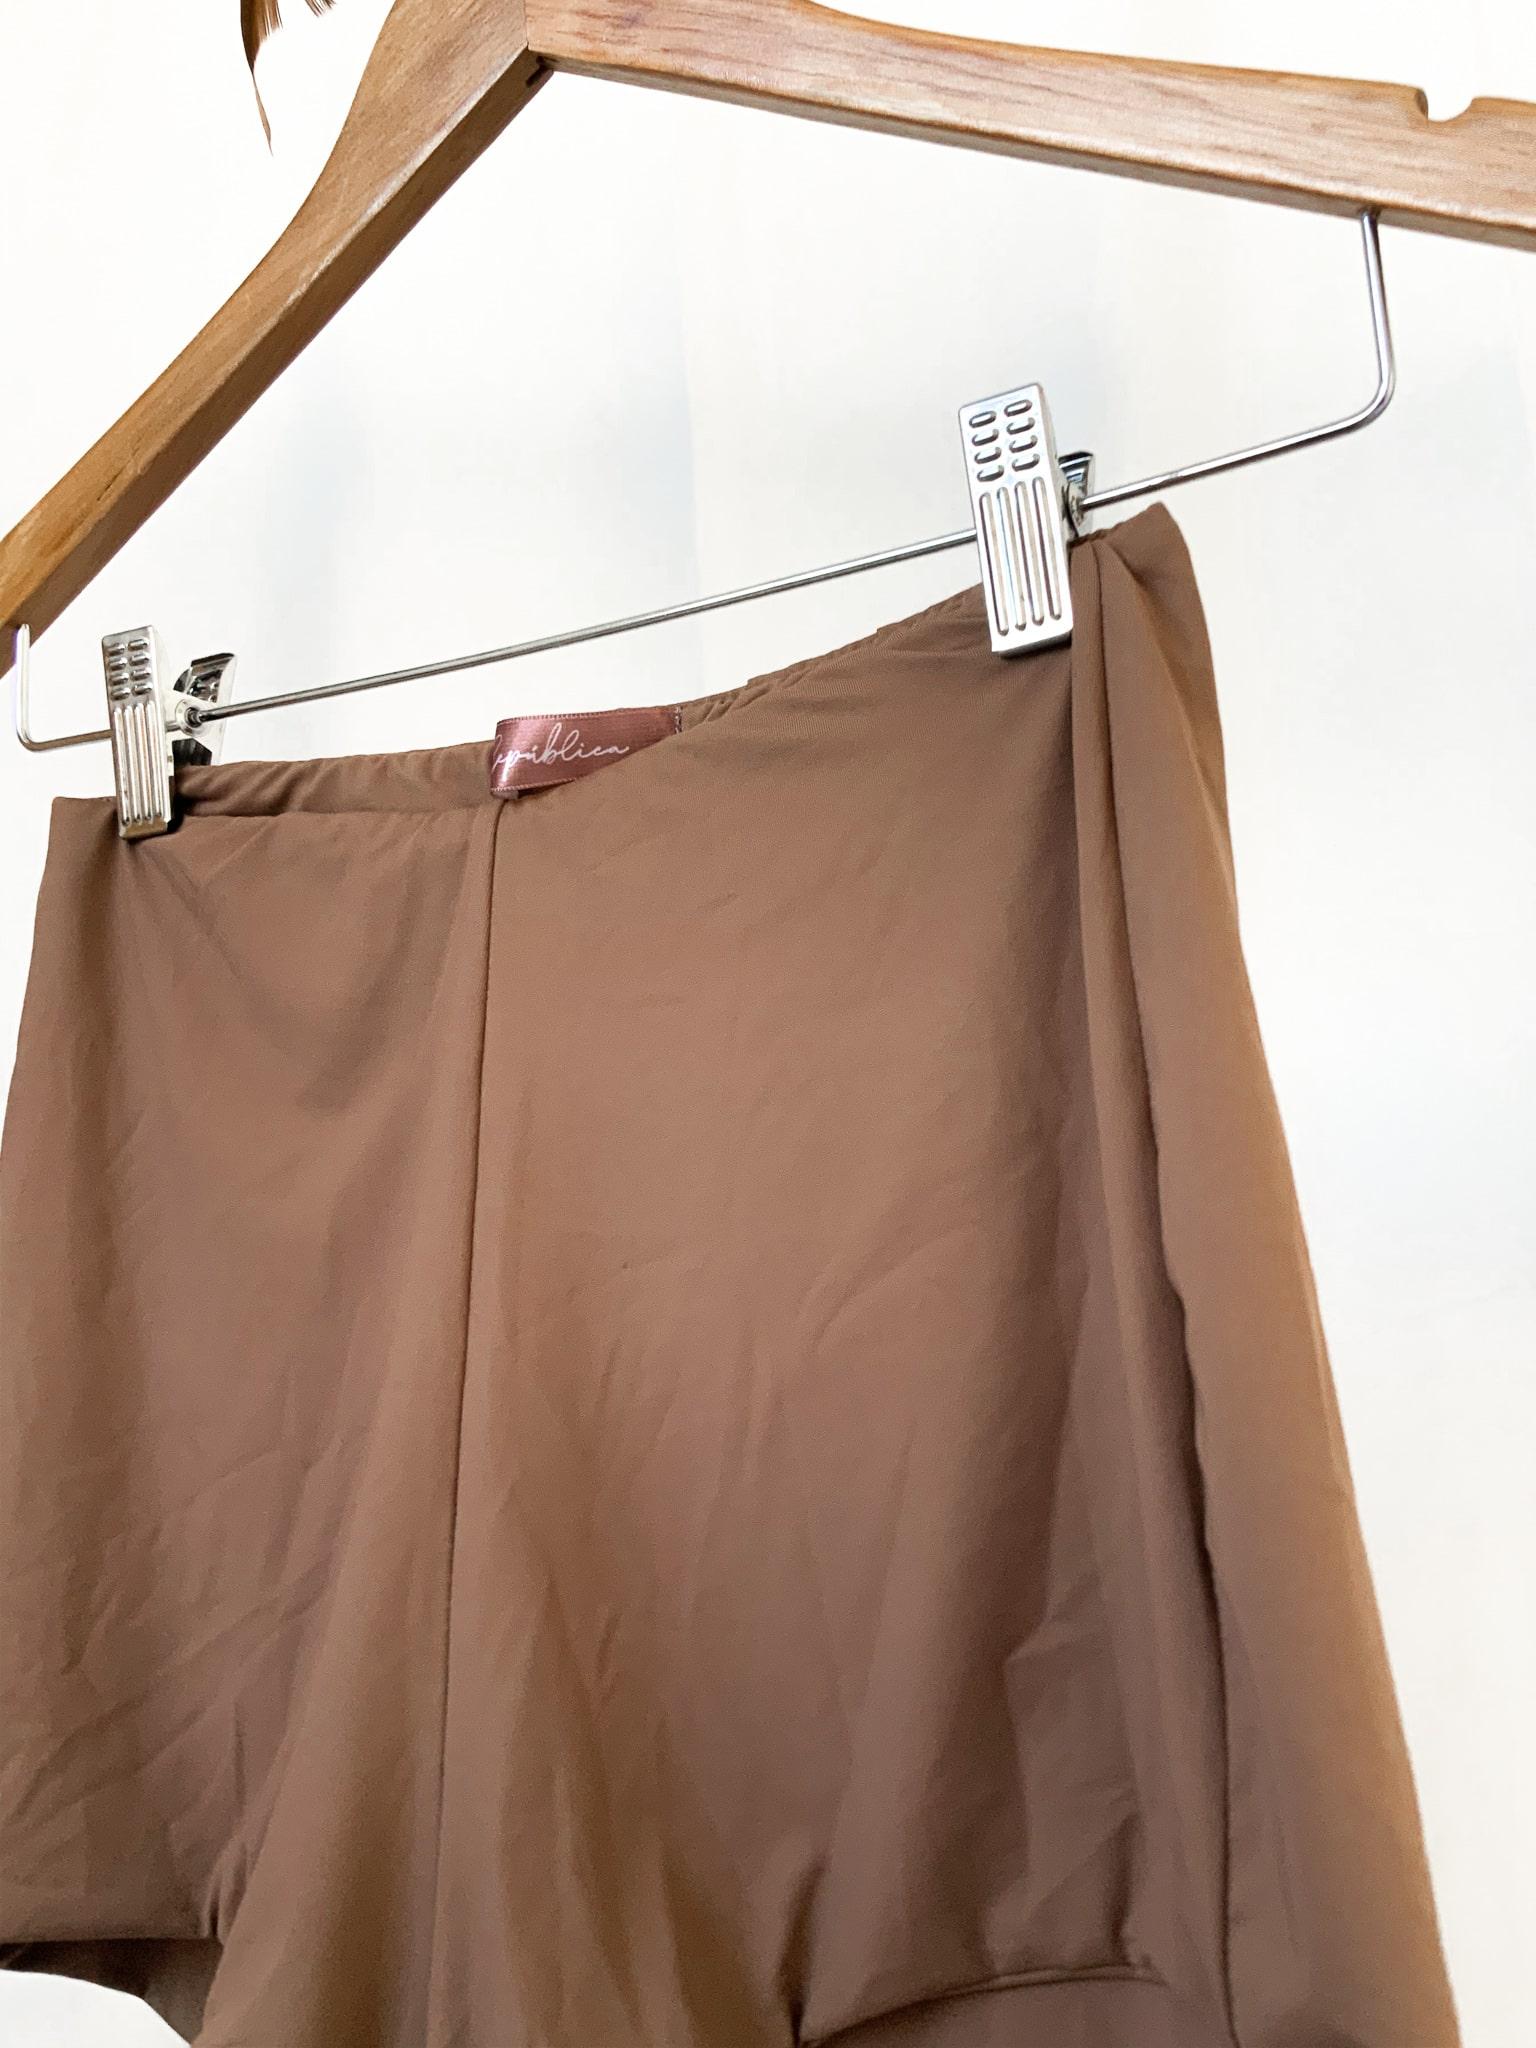 hot pants nude 2